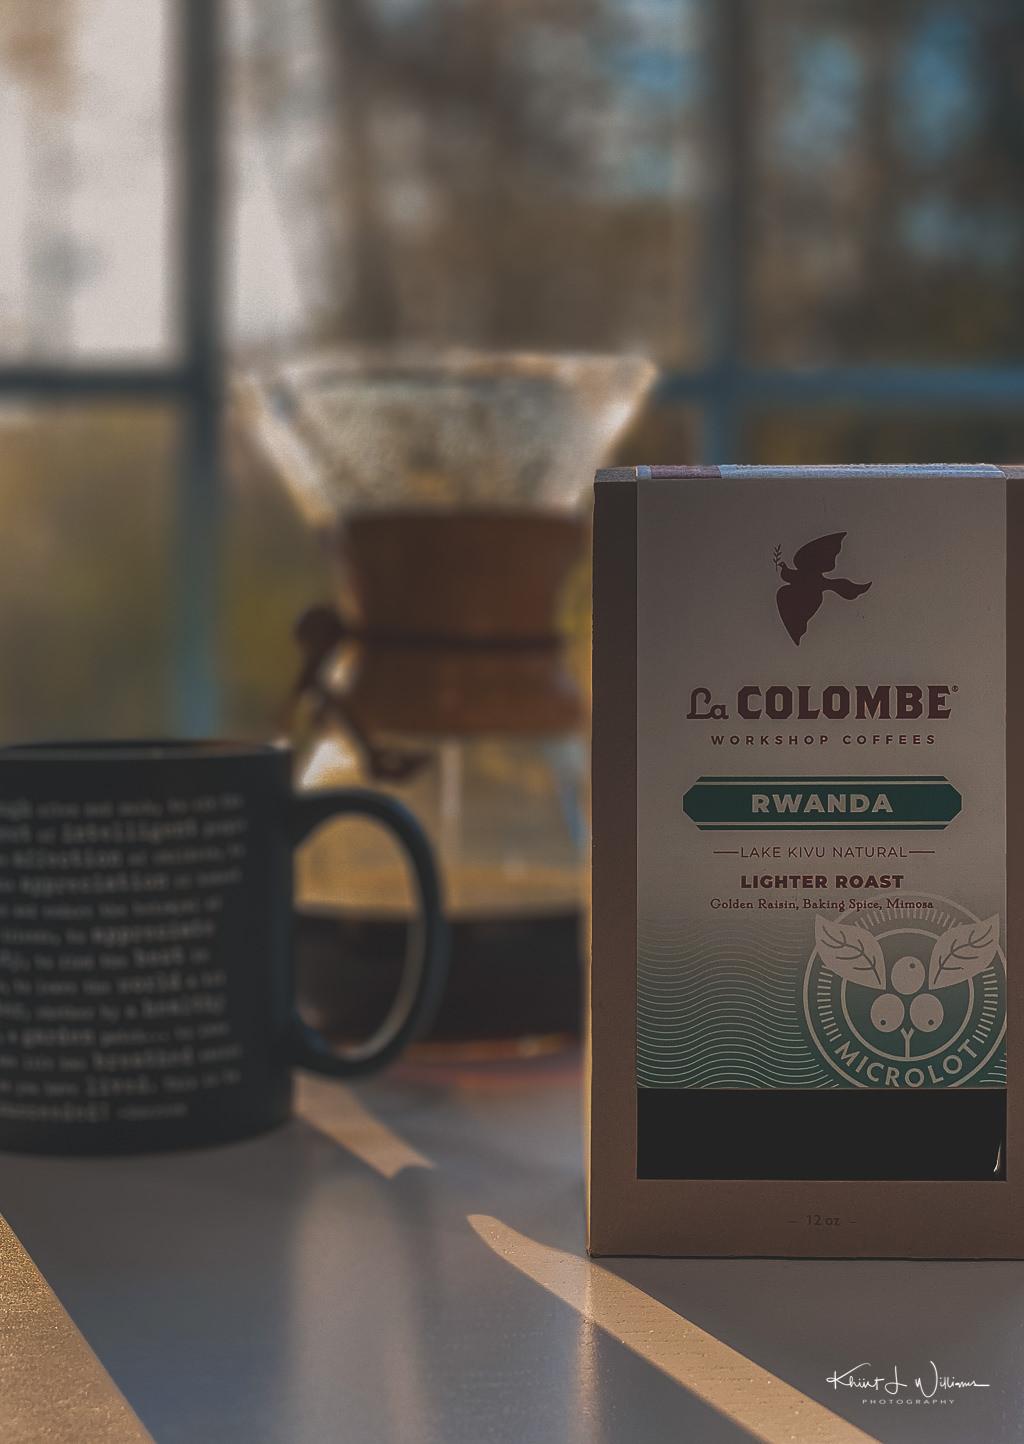 LaColombe Workshop Coffees Rwanda Coffee, Coffee Mug, Chemex Carafe, Table, Window